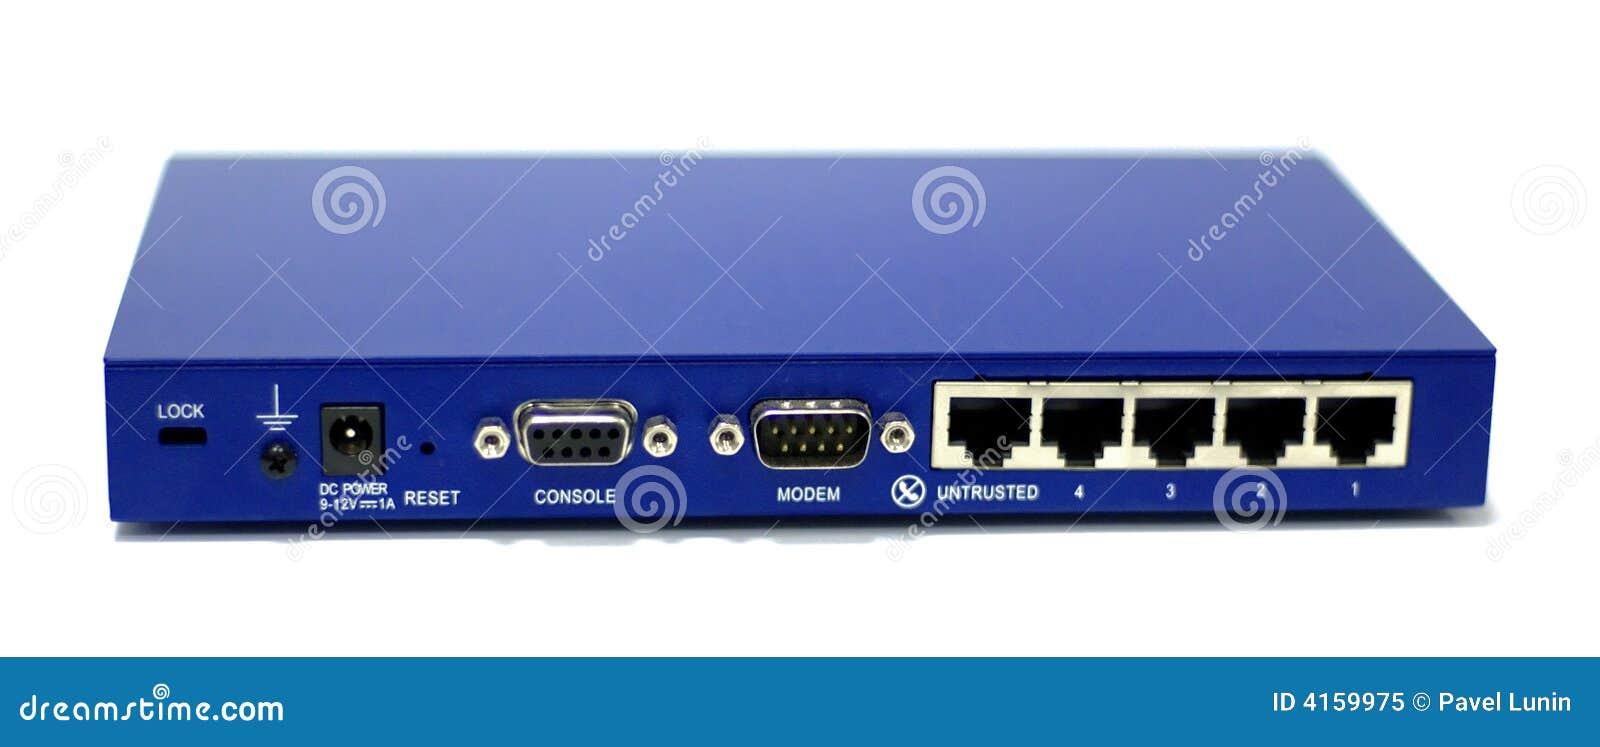 Small firewall stock image. Image of broadband, industry - 4159975